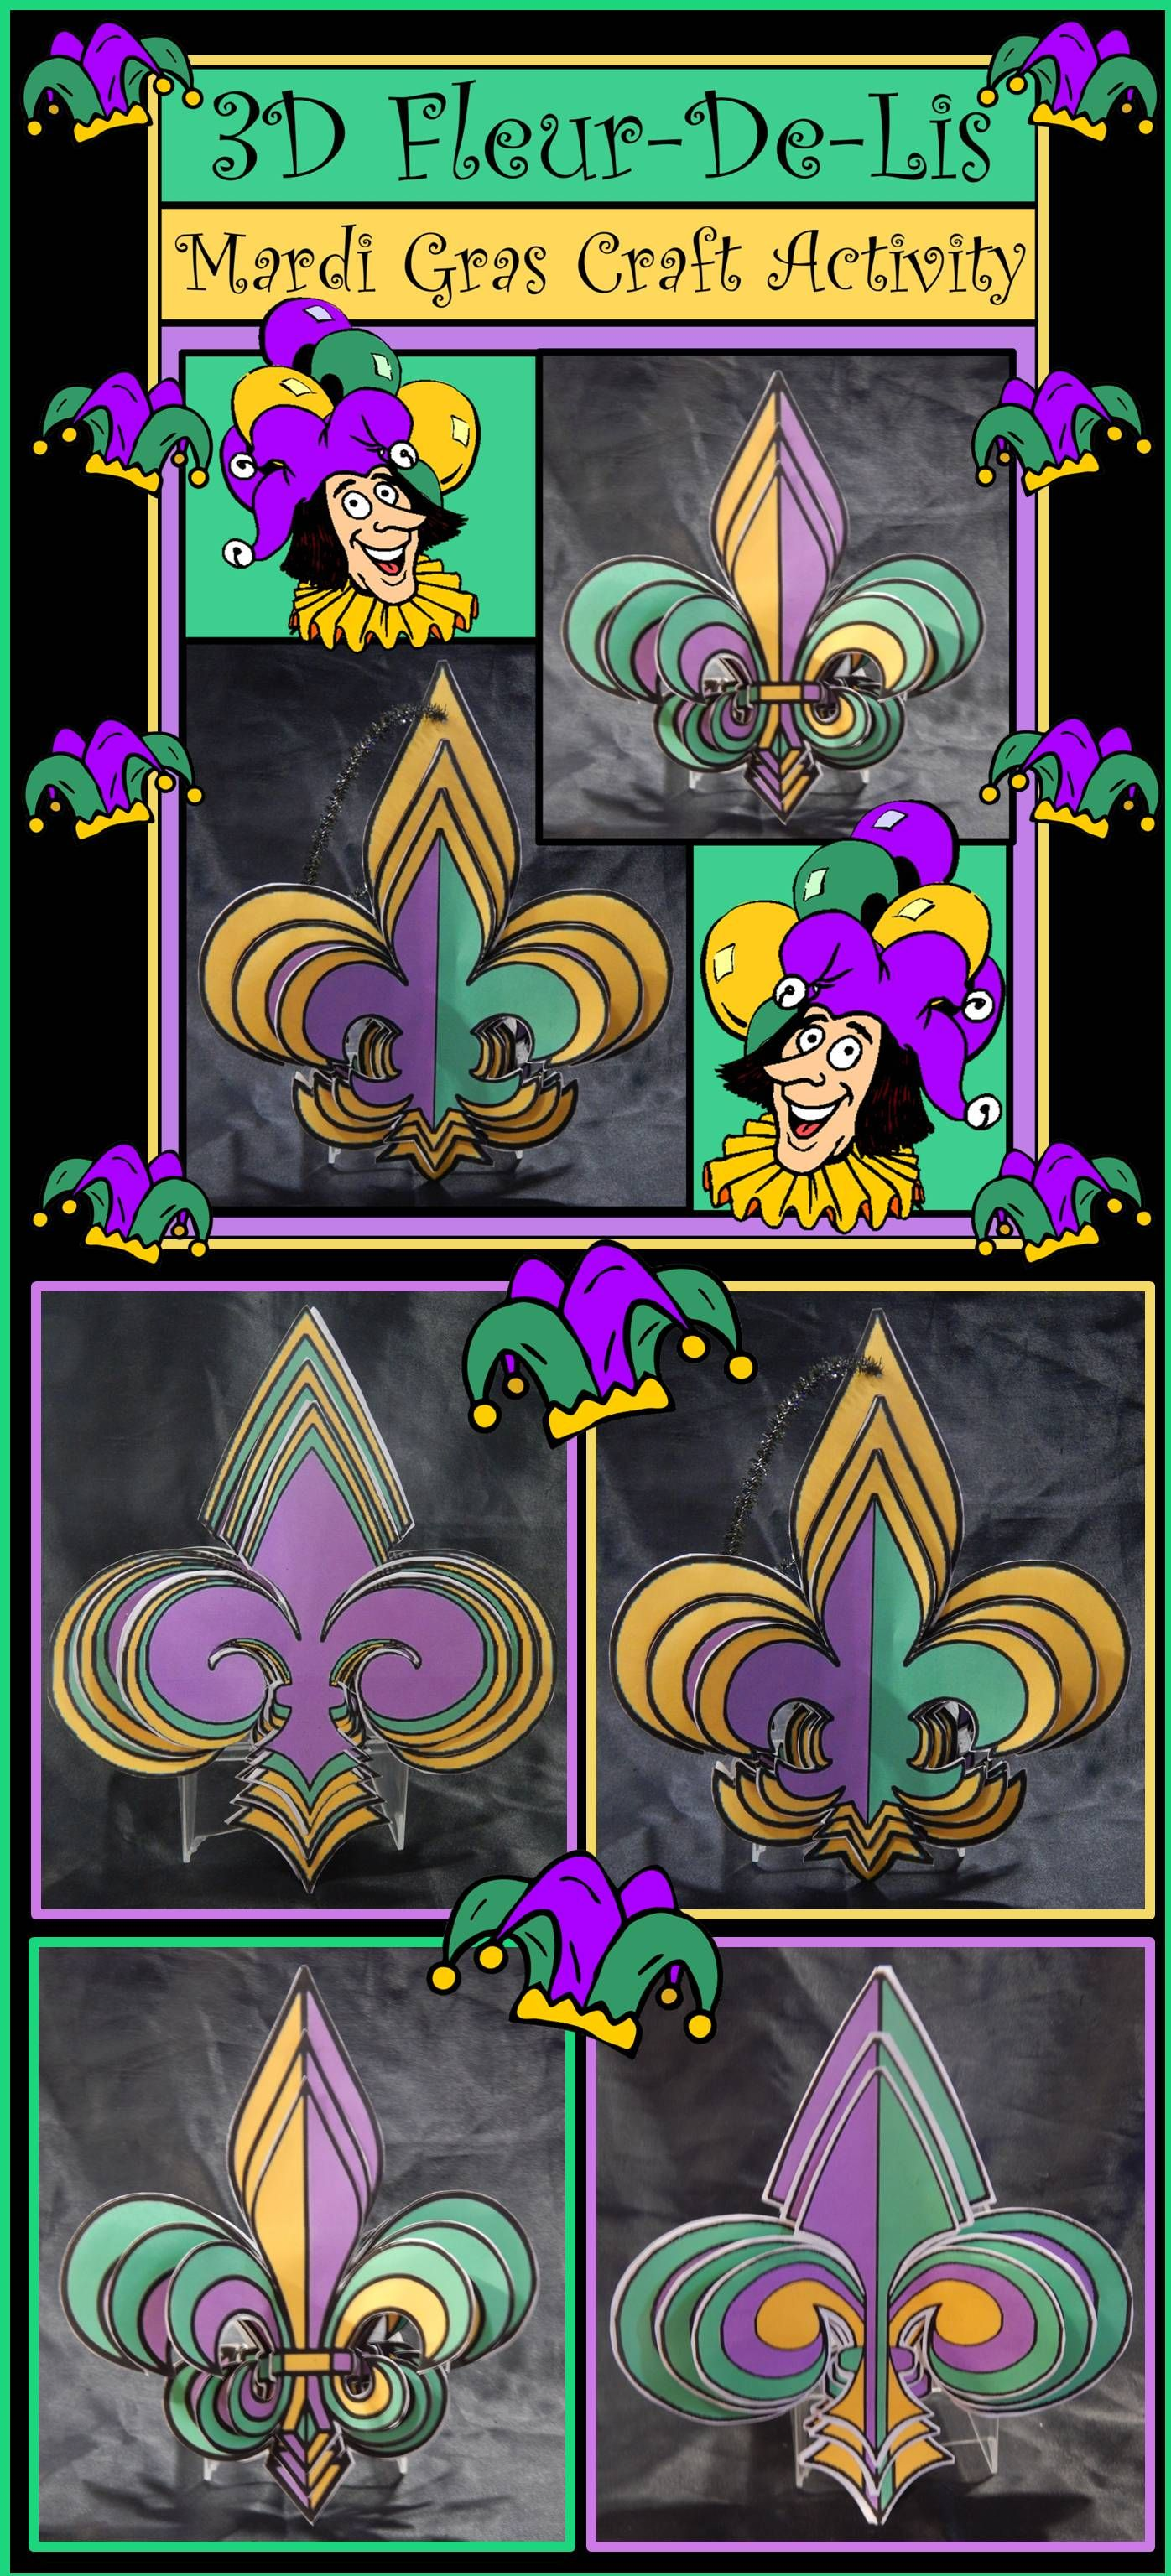 Mardi Gras Craft Activities 3d Fleur De Lis Craft